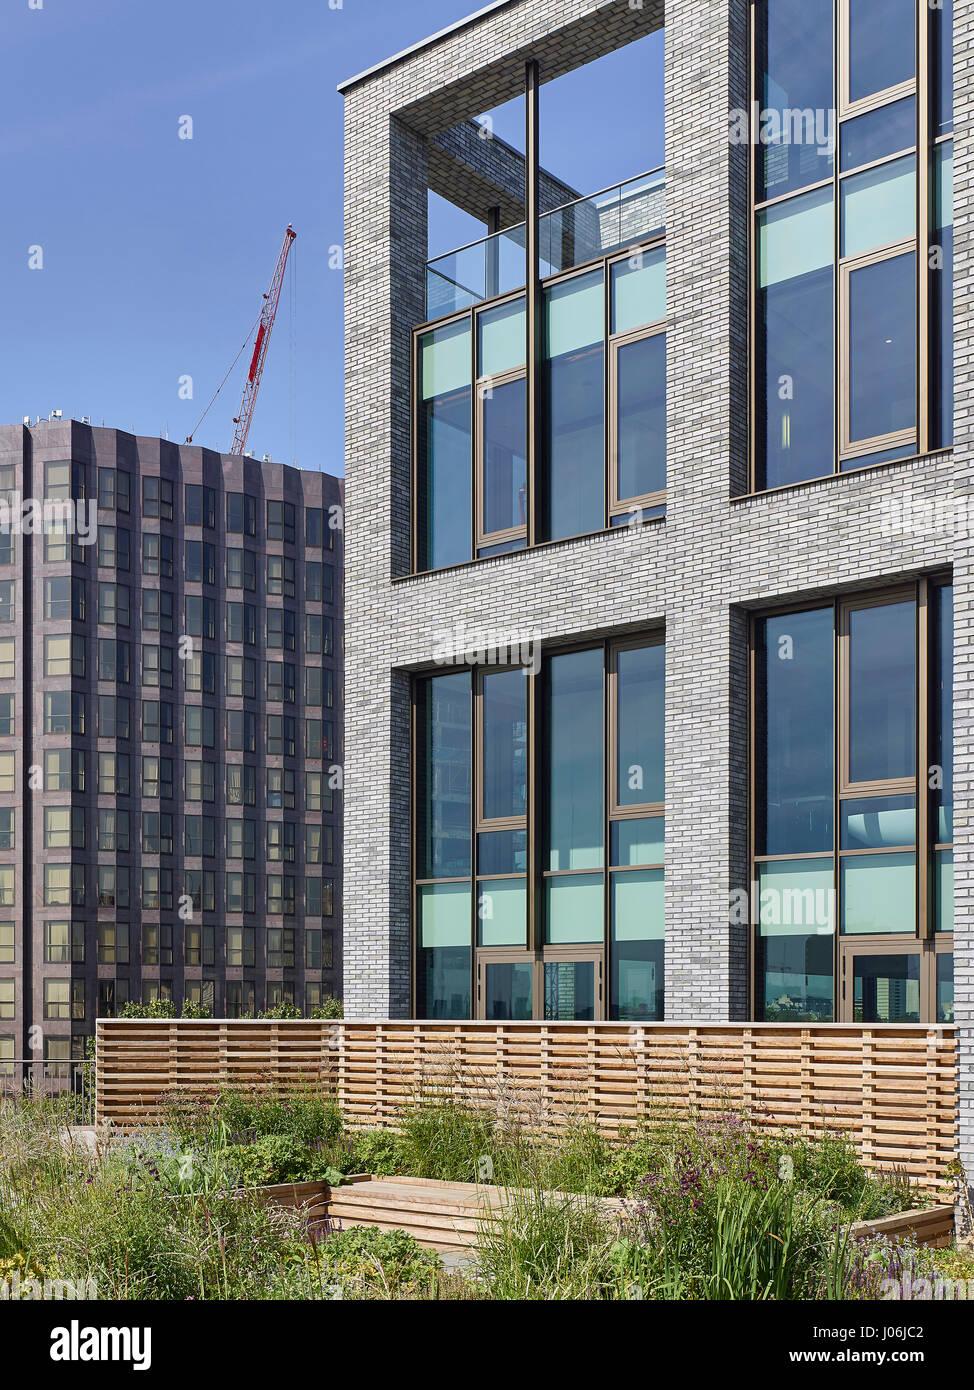 General view. 55 Victoria Street, London, United Kingdom. Architect: Stiff + Trevillion Architects, 2016. - Stock Image